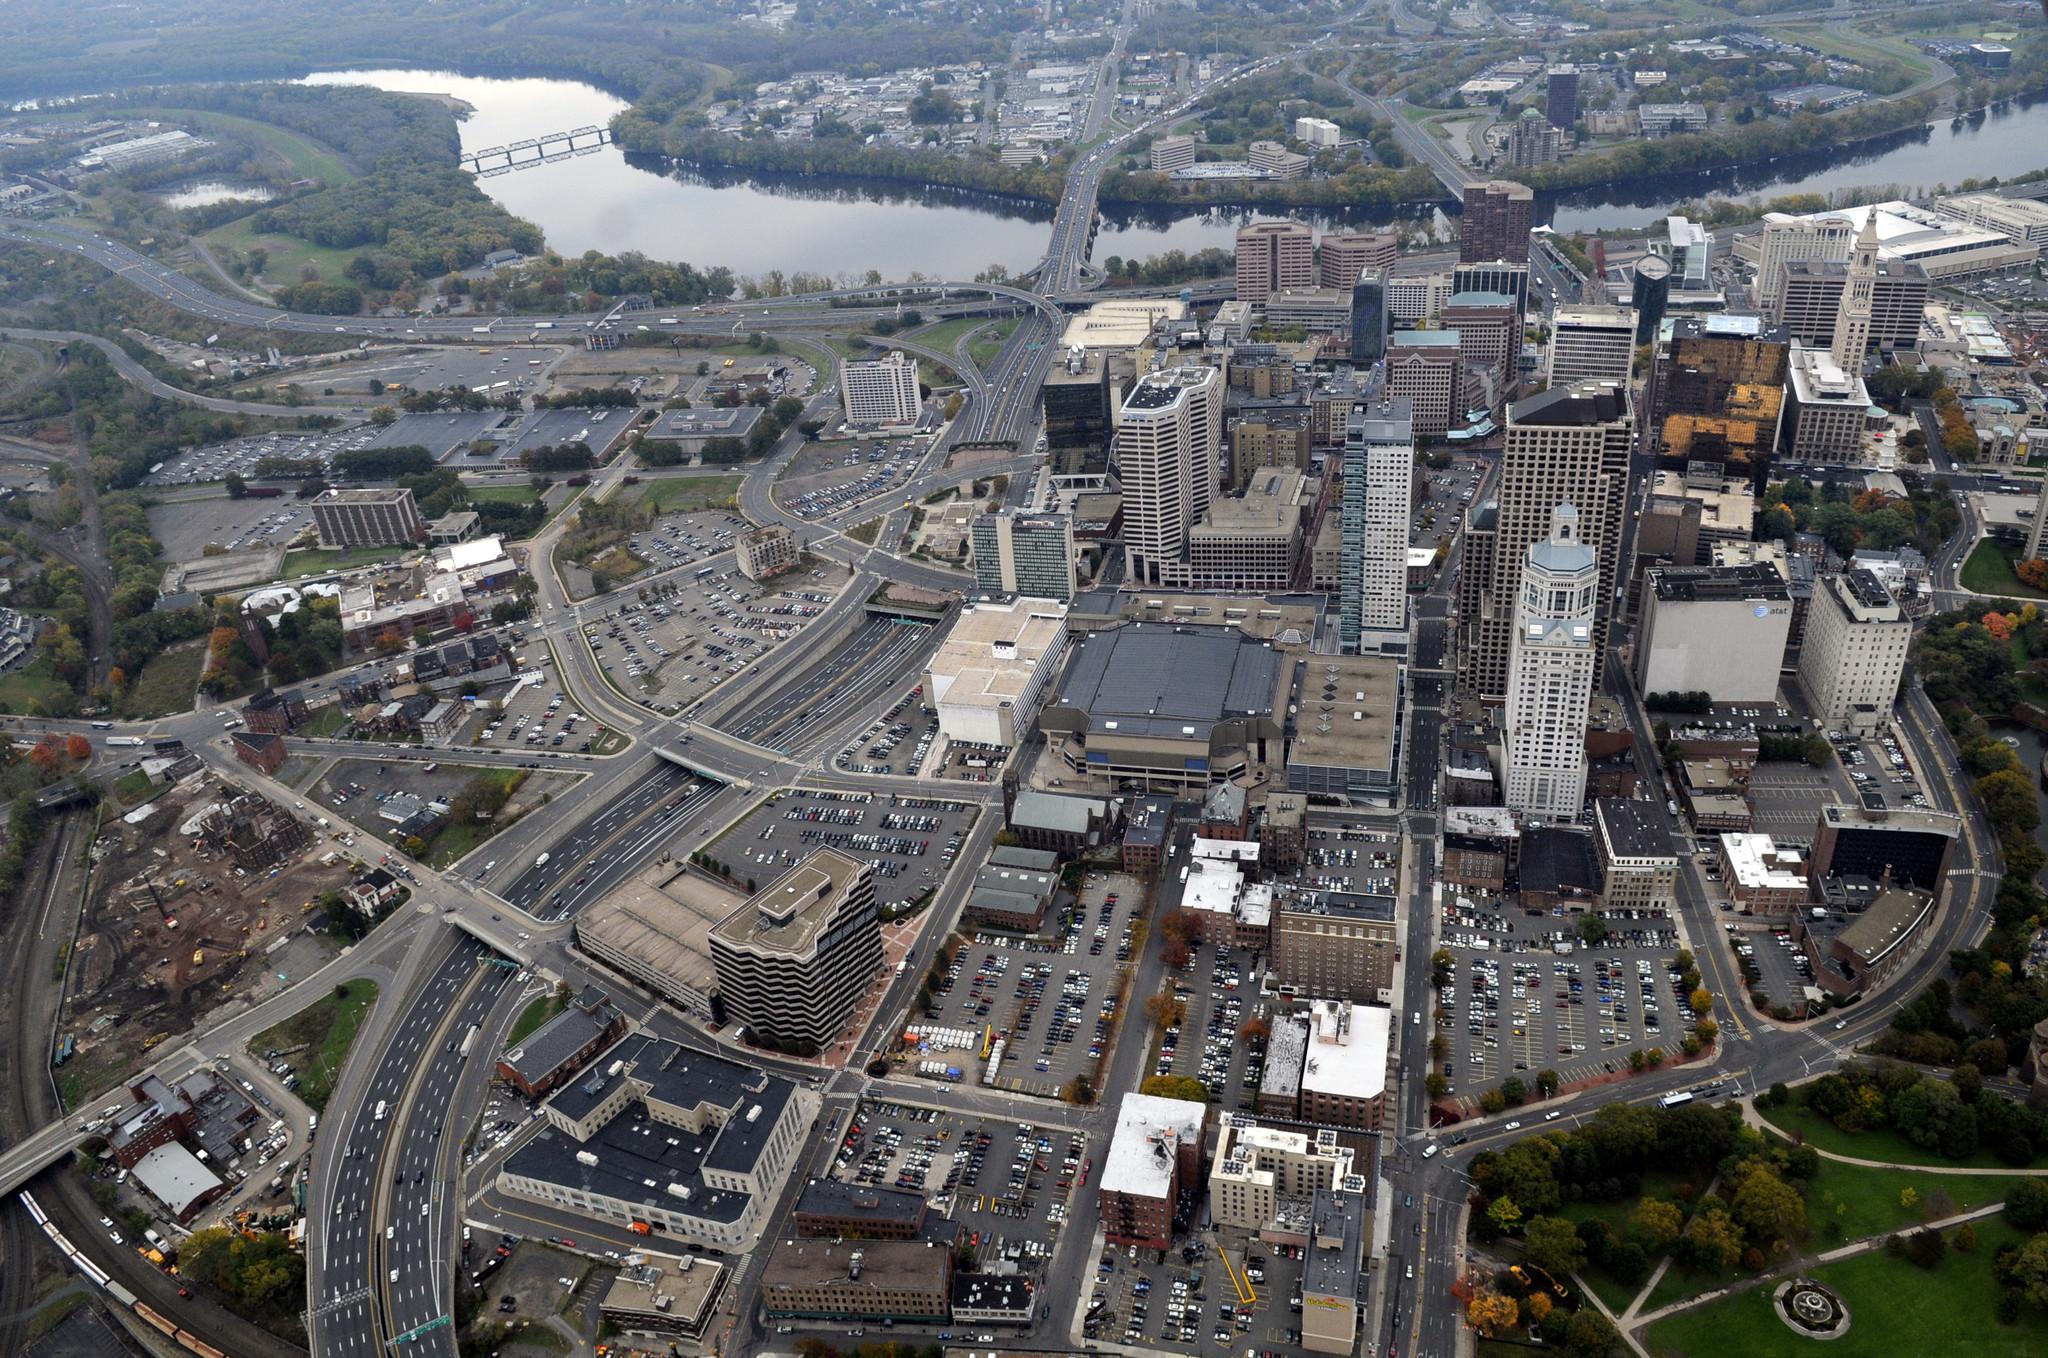 ... Development Contest In Hartford Enters Second Round - Hartford Courant